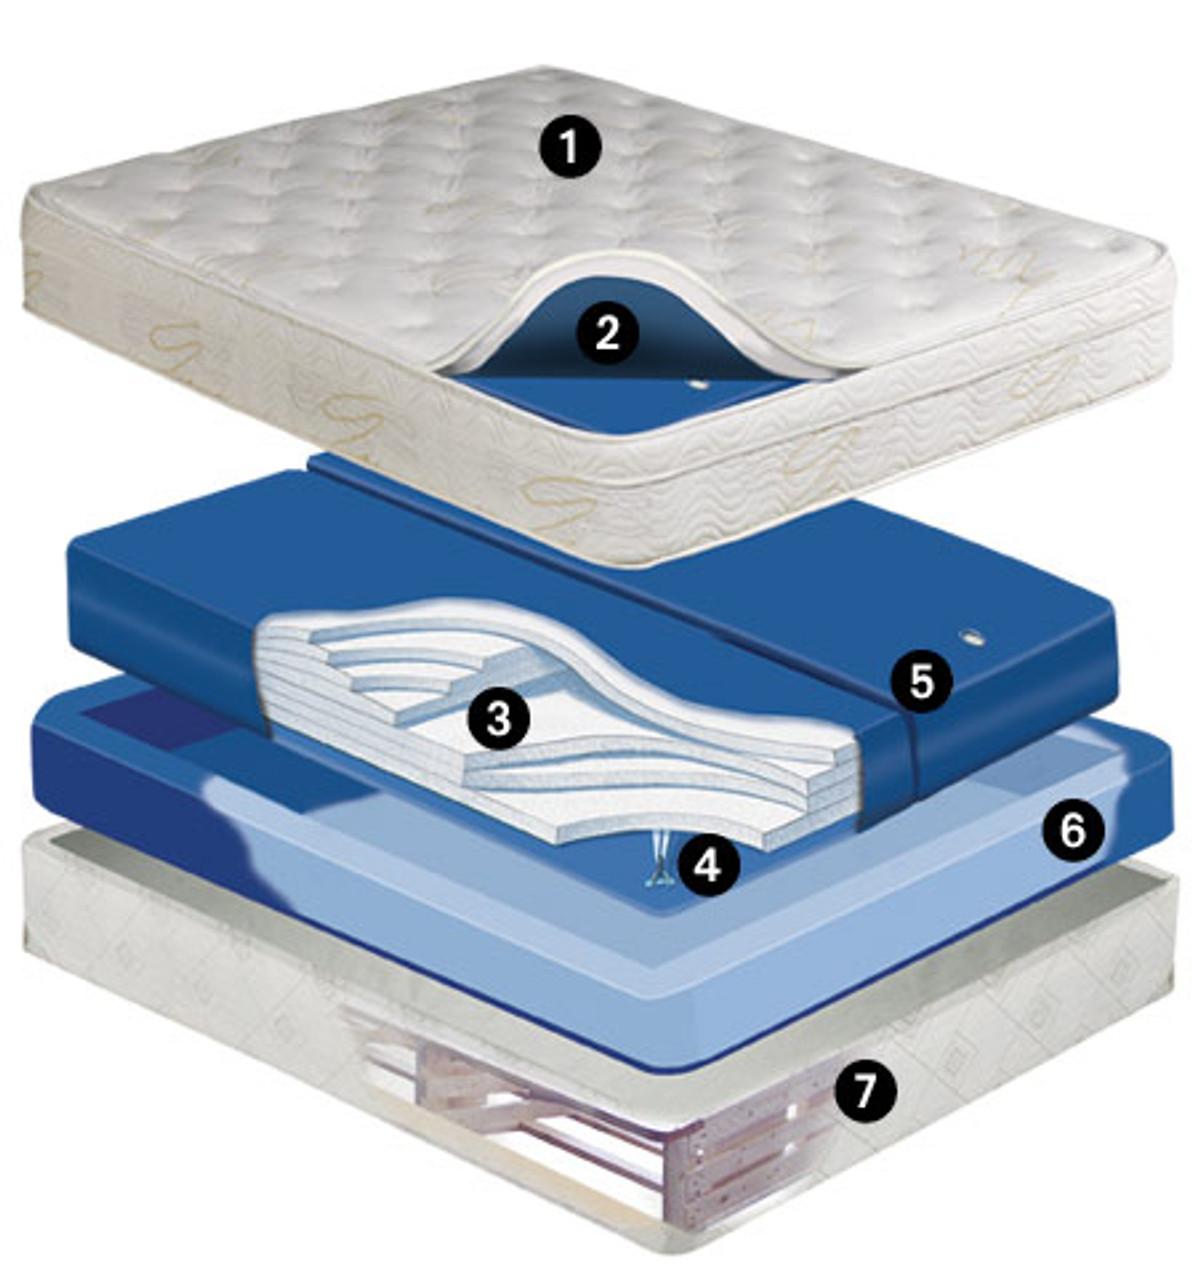 Equinox Deep Fill 9 inch Softside Waterbed Mattress Dual Chamber Waveless Mattress